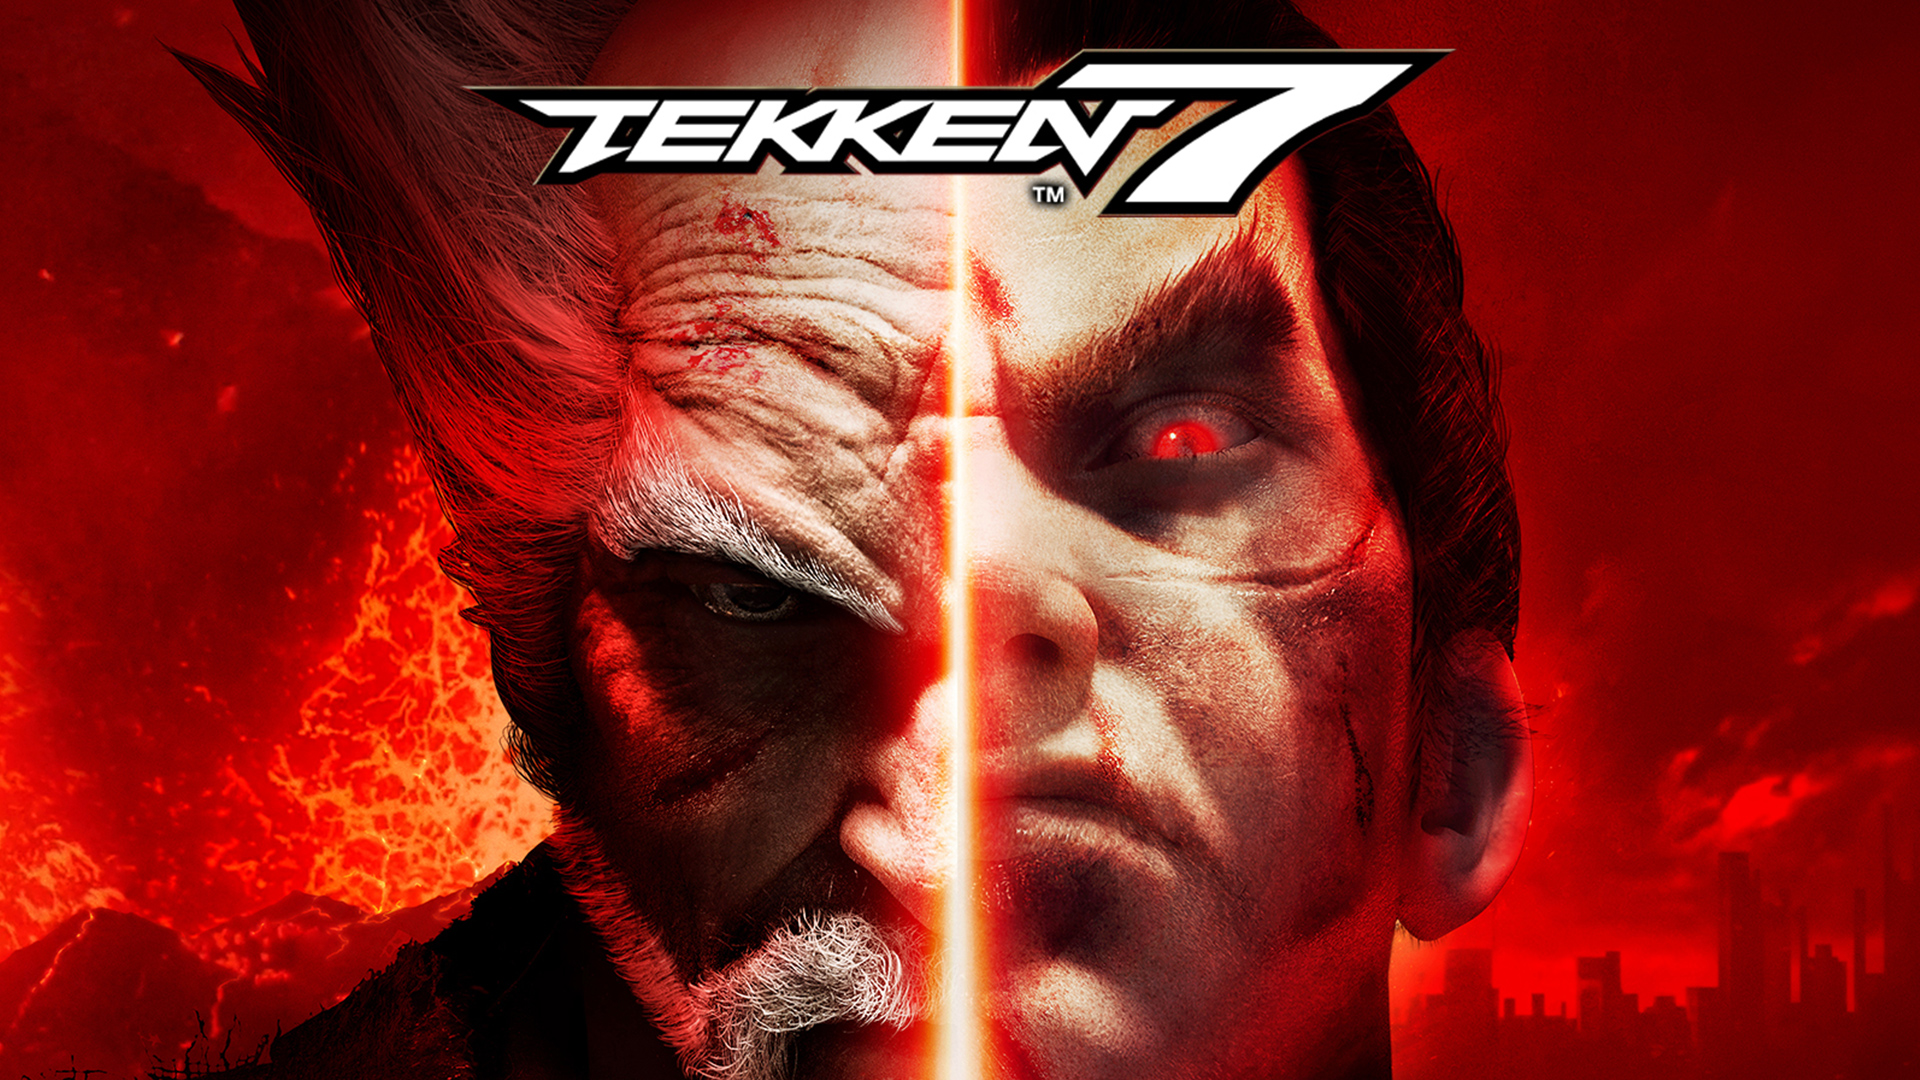 Tekken 7 do zgarnięcia za bezcen. Świetna promocja na gry Bandai Namco 18